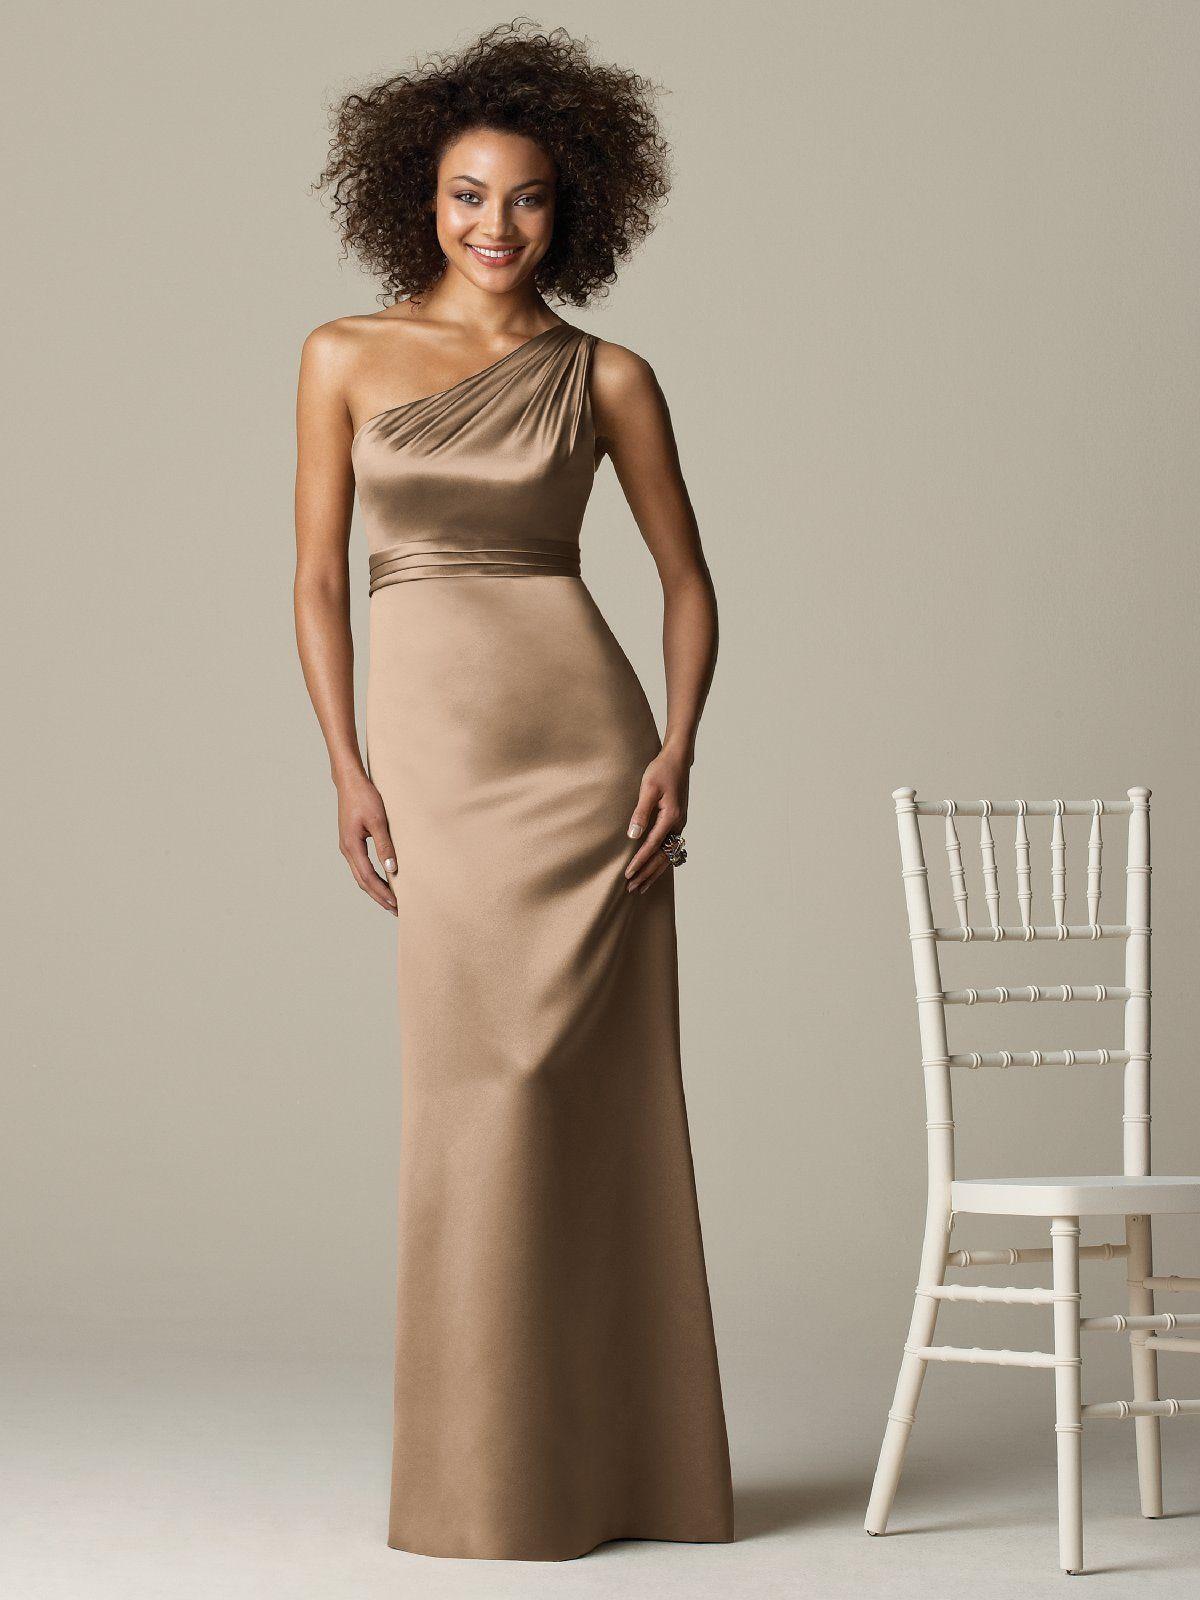 one shoulder prom dress champagne color